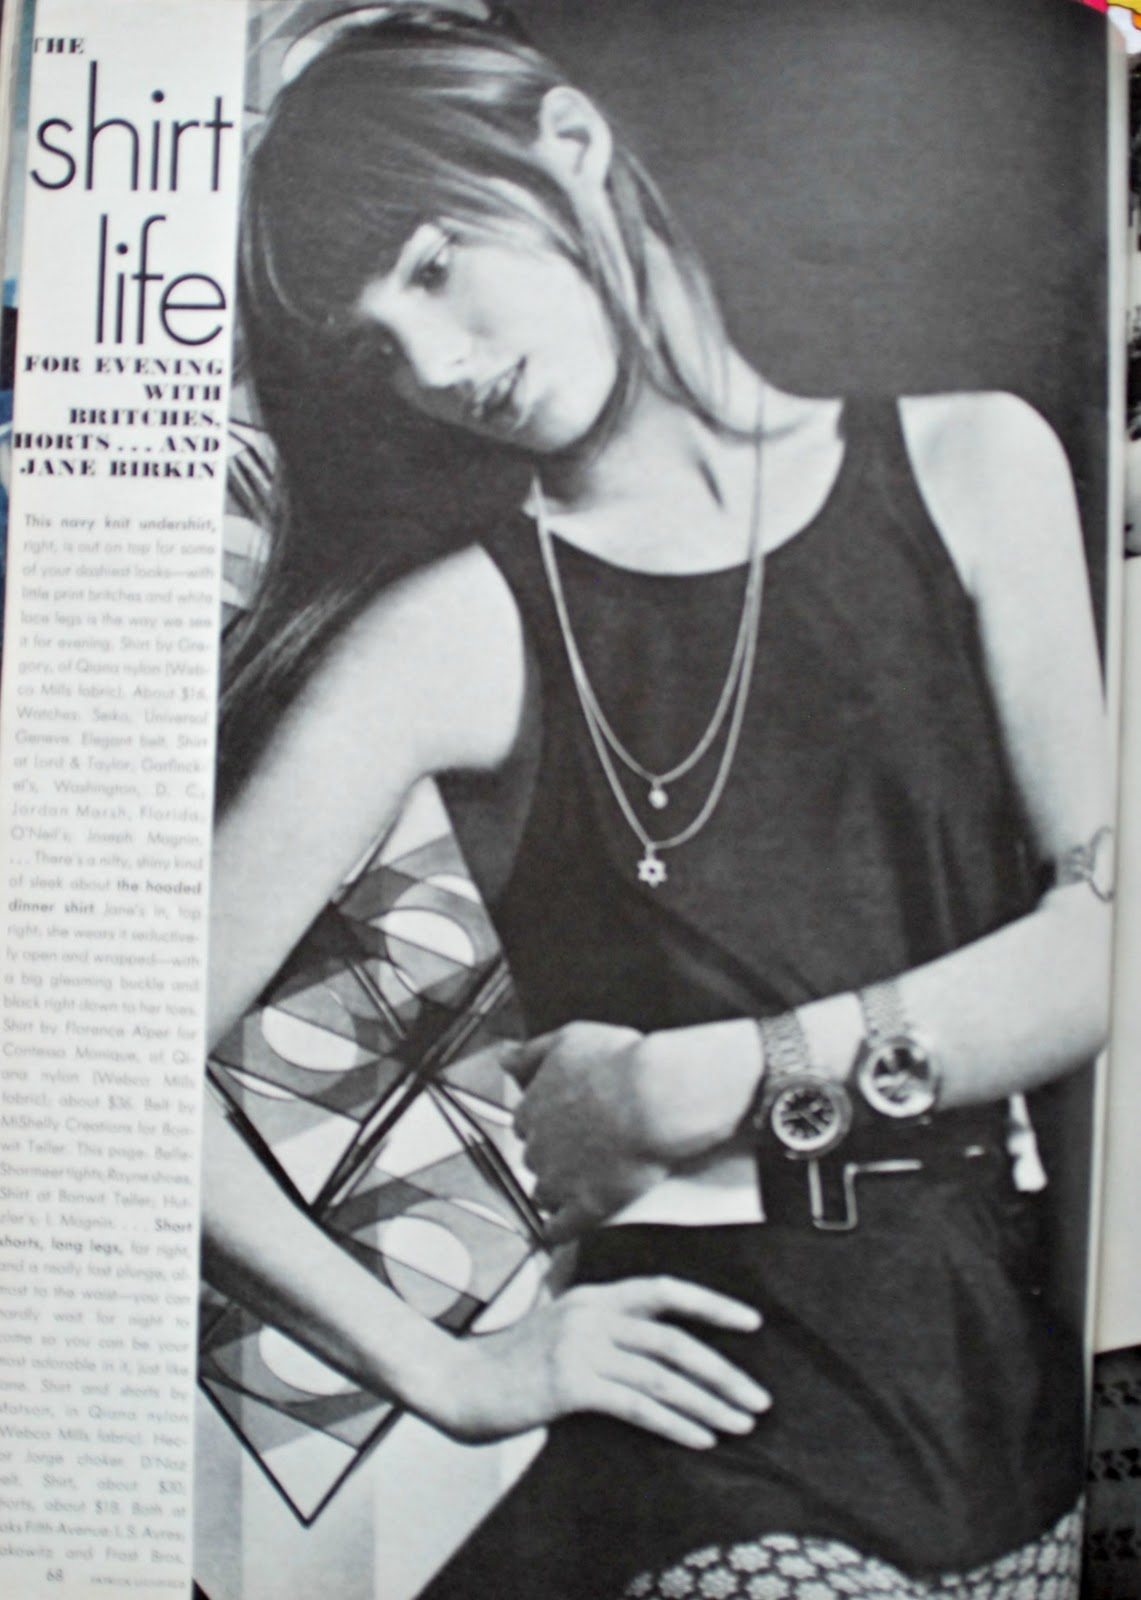 http://4.bp.blogspot.com/-1oVjdhXOjow/TrwOcKX61JI/AAAAAAAABF4/cqoLvKno8fM/s1600/vogue+march+1971+jane+birkin+page.jpg